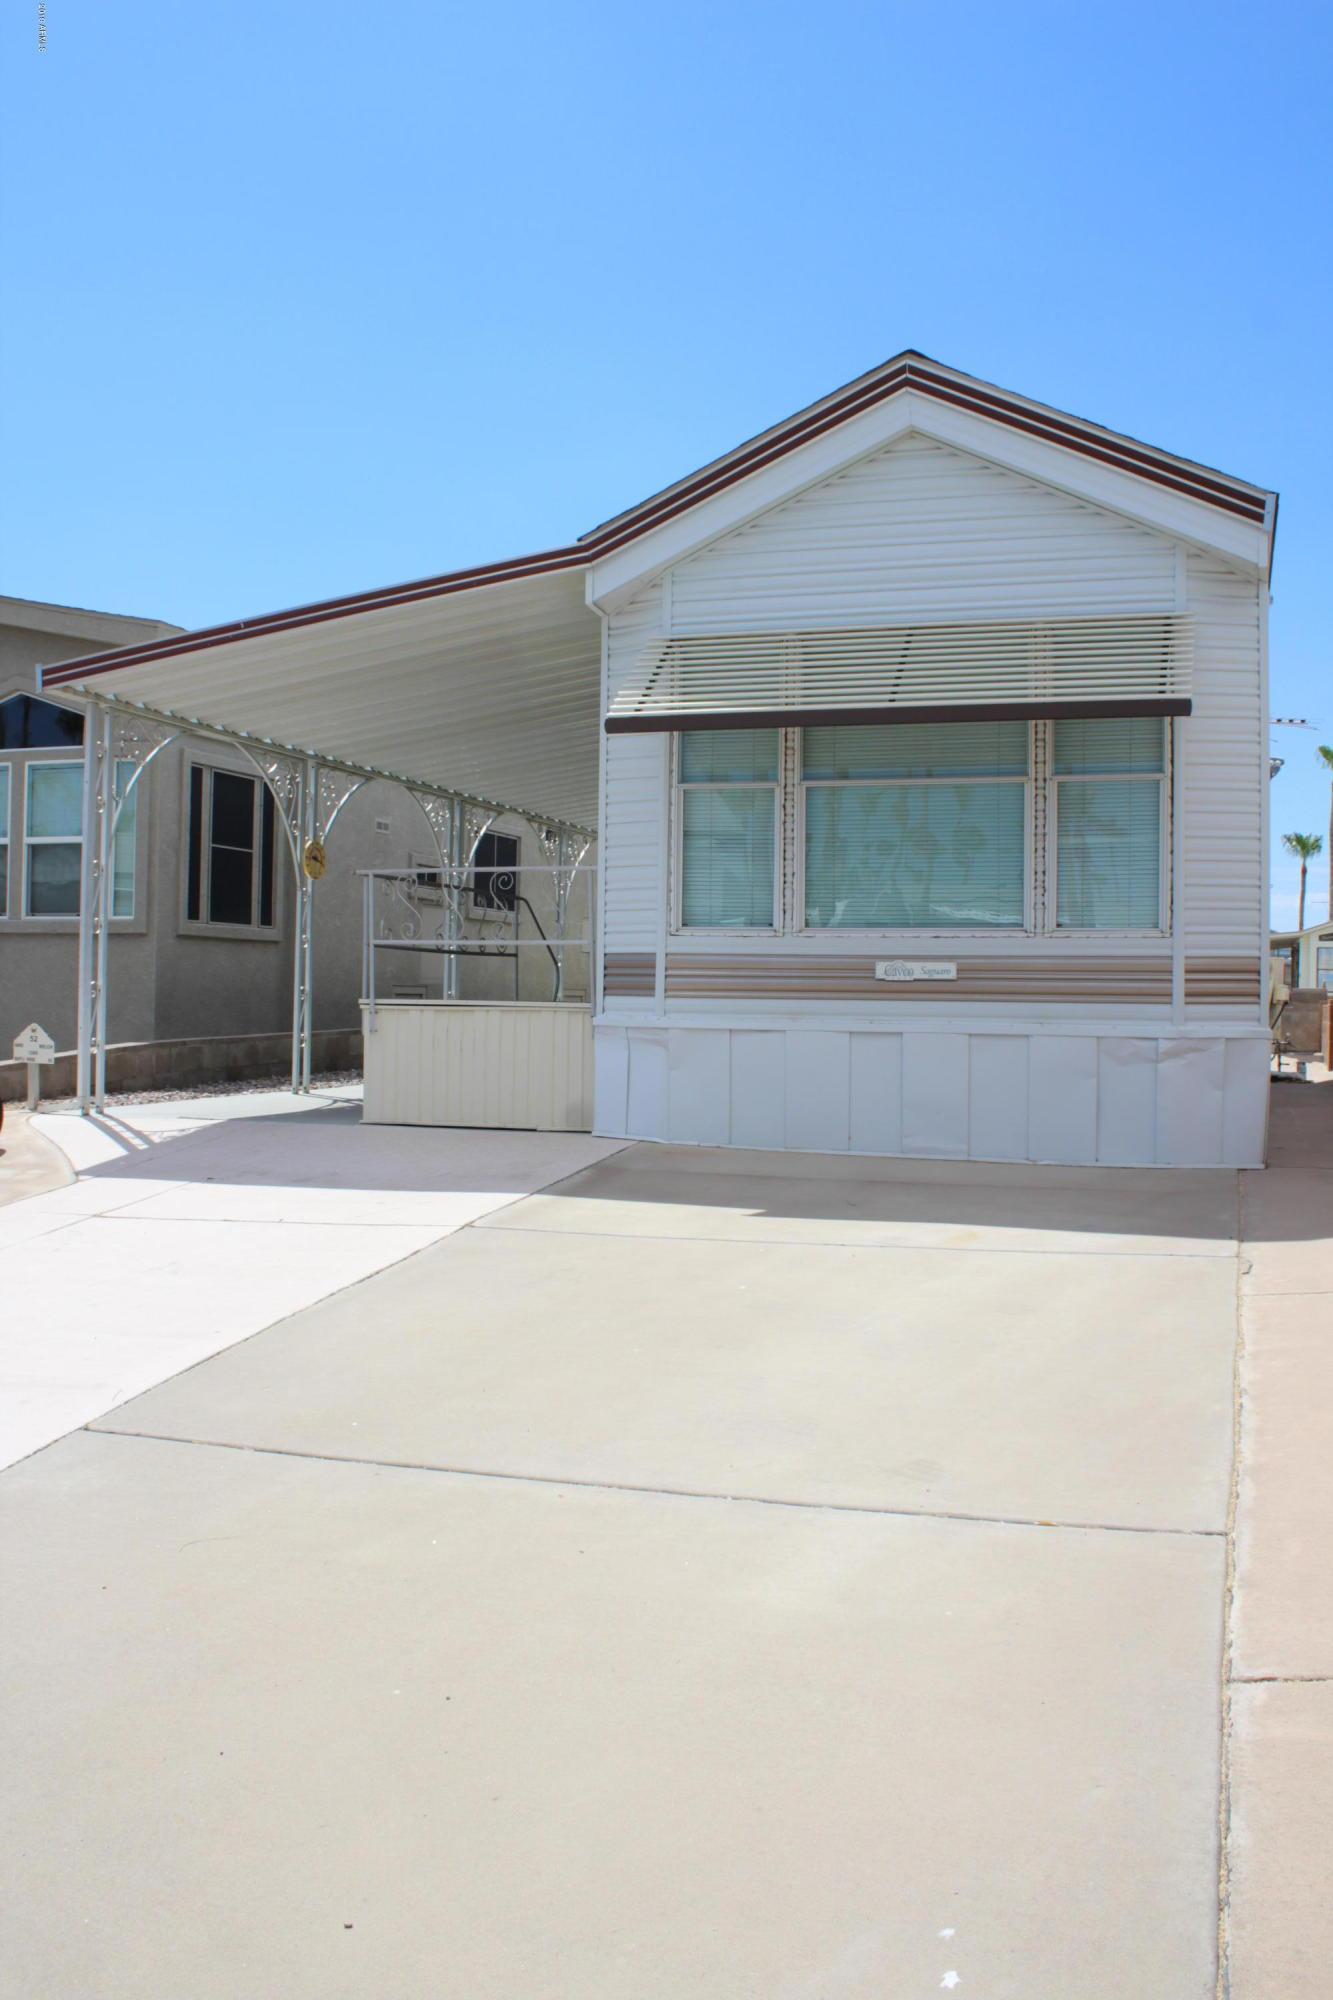 Photo of 52 W KIOWA Circle, Apache Junction, AZ 85119